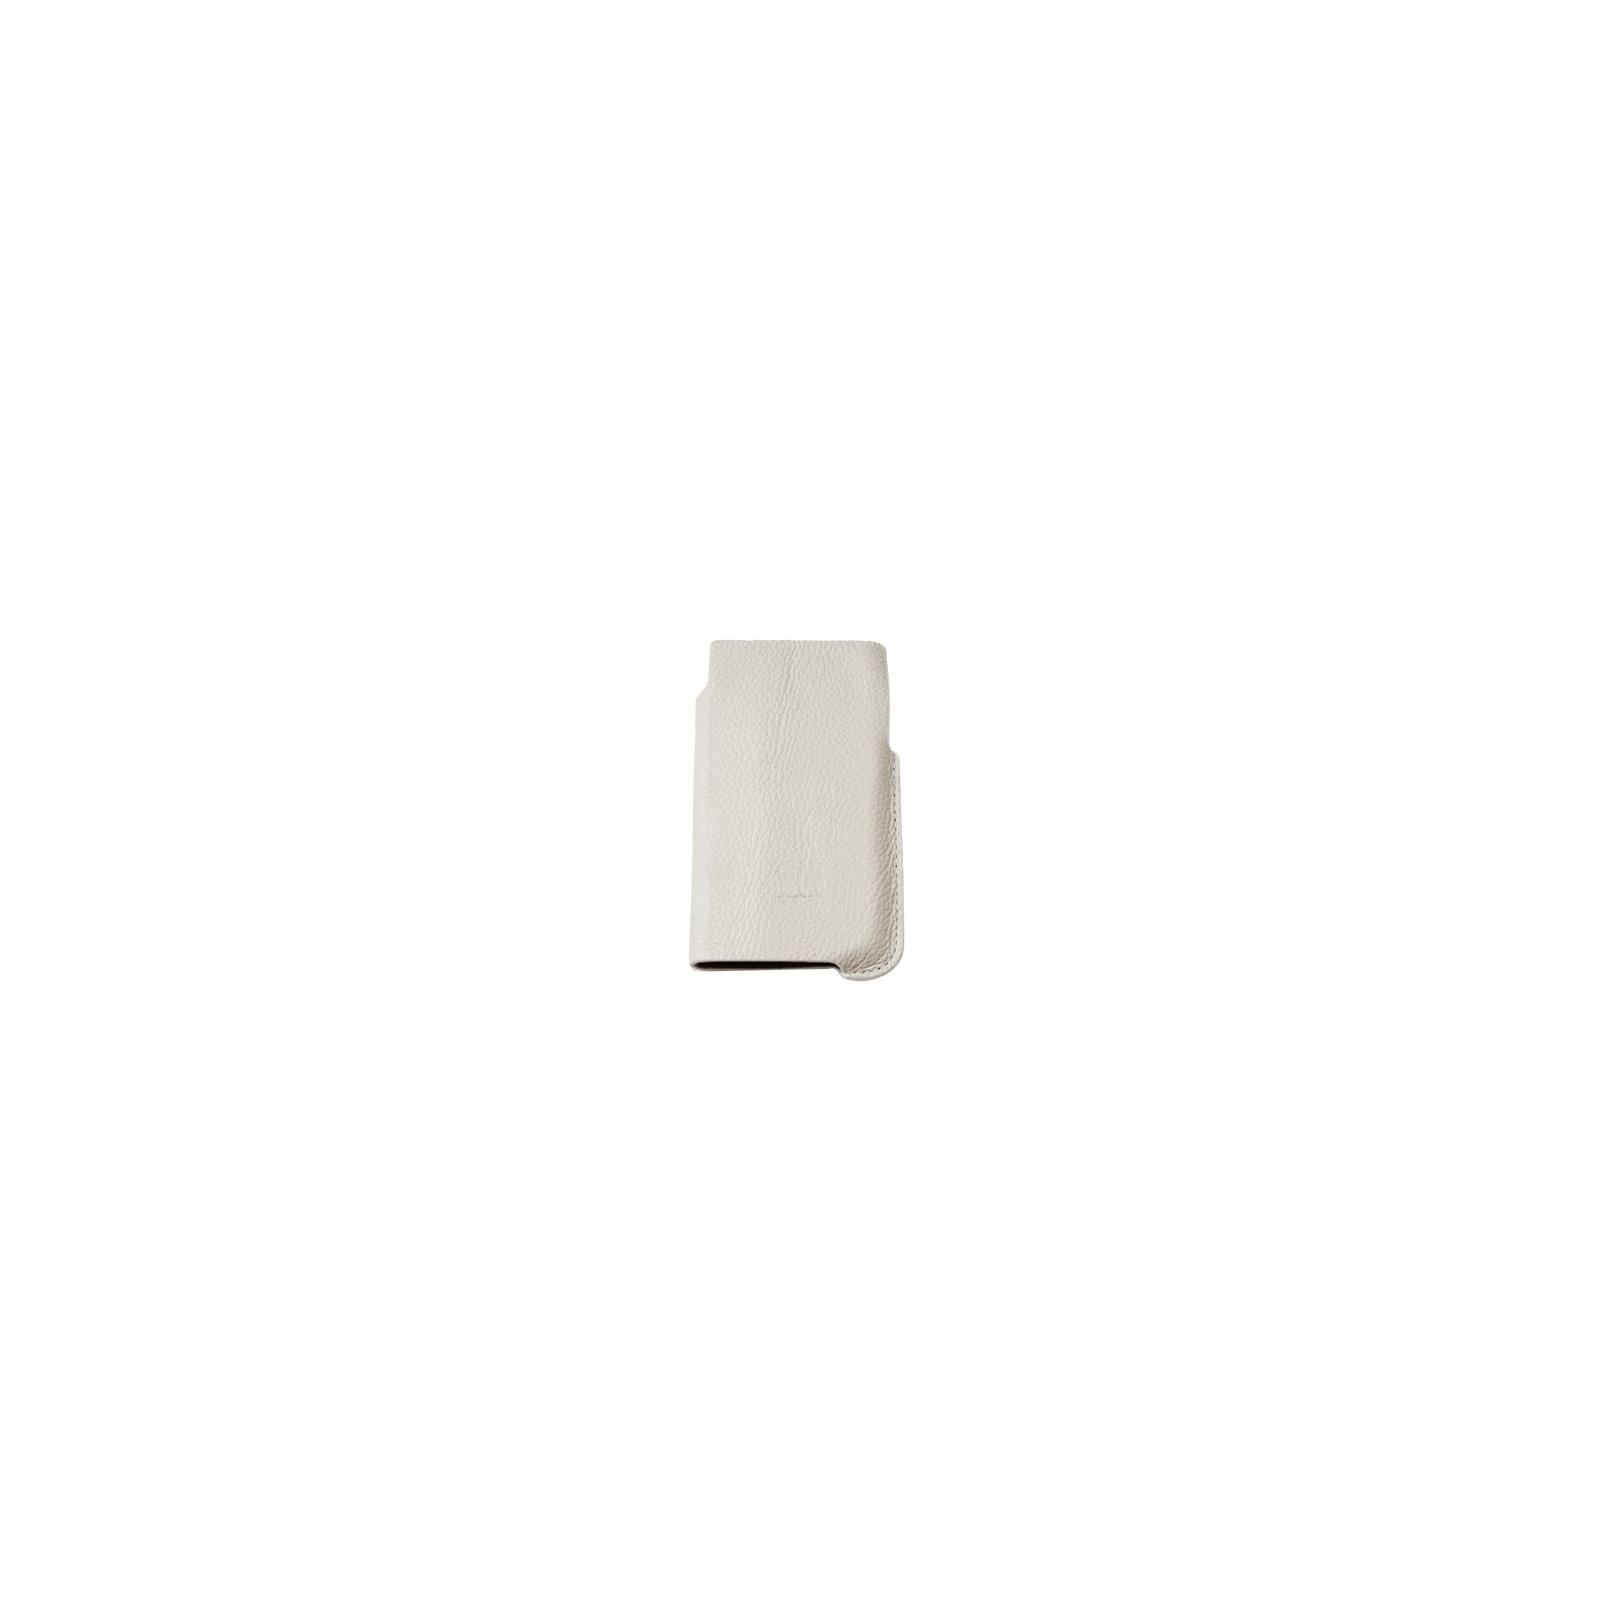 Чехол для моб. телефона Drobak для Nokia 520 Lumia /Classic pocket White (215103) изображение 2